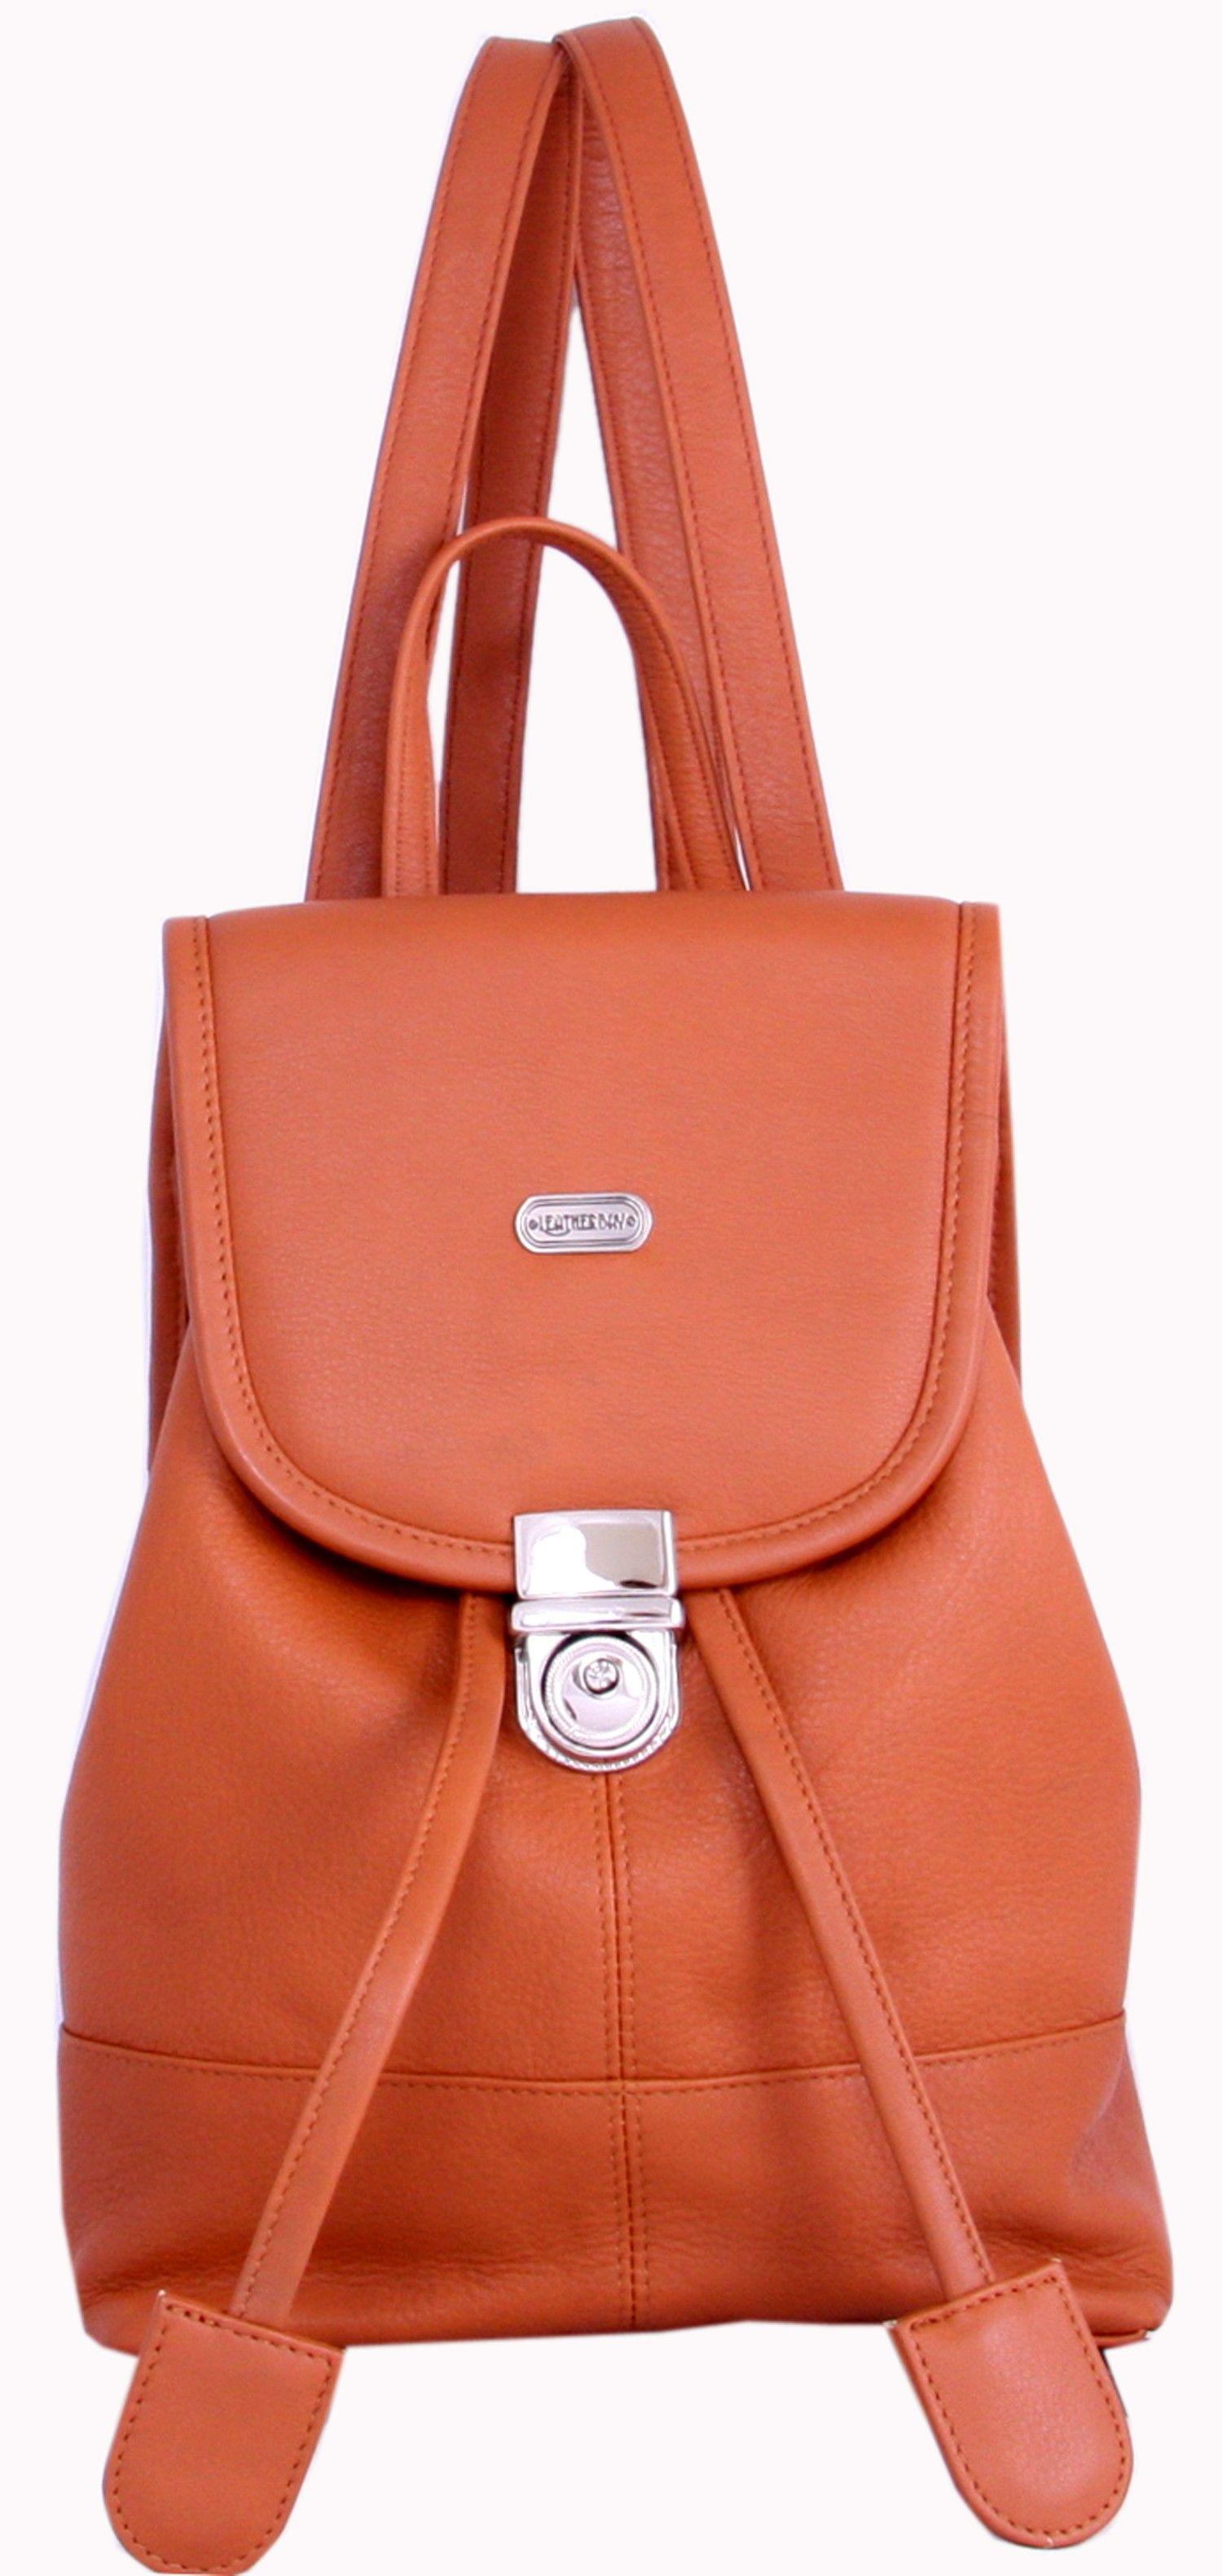 Small Backpack Purse - Backpakc Fam  93f0a16e0b6ea